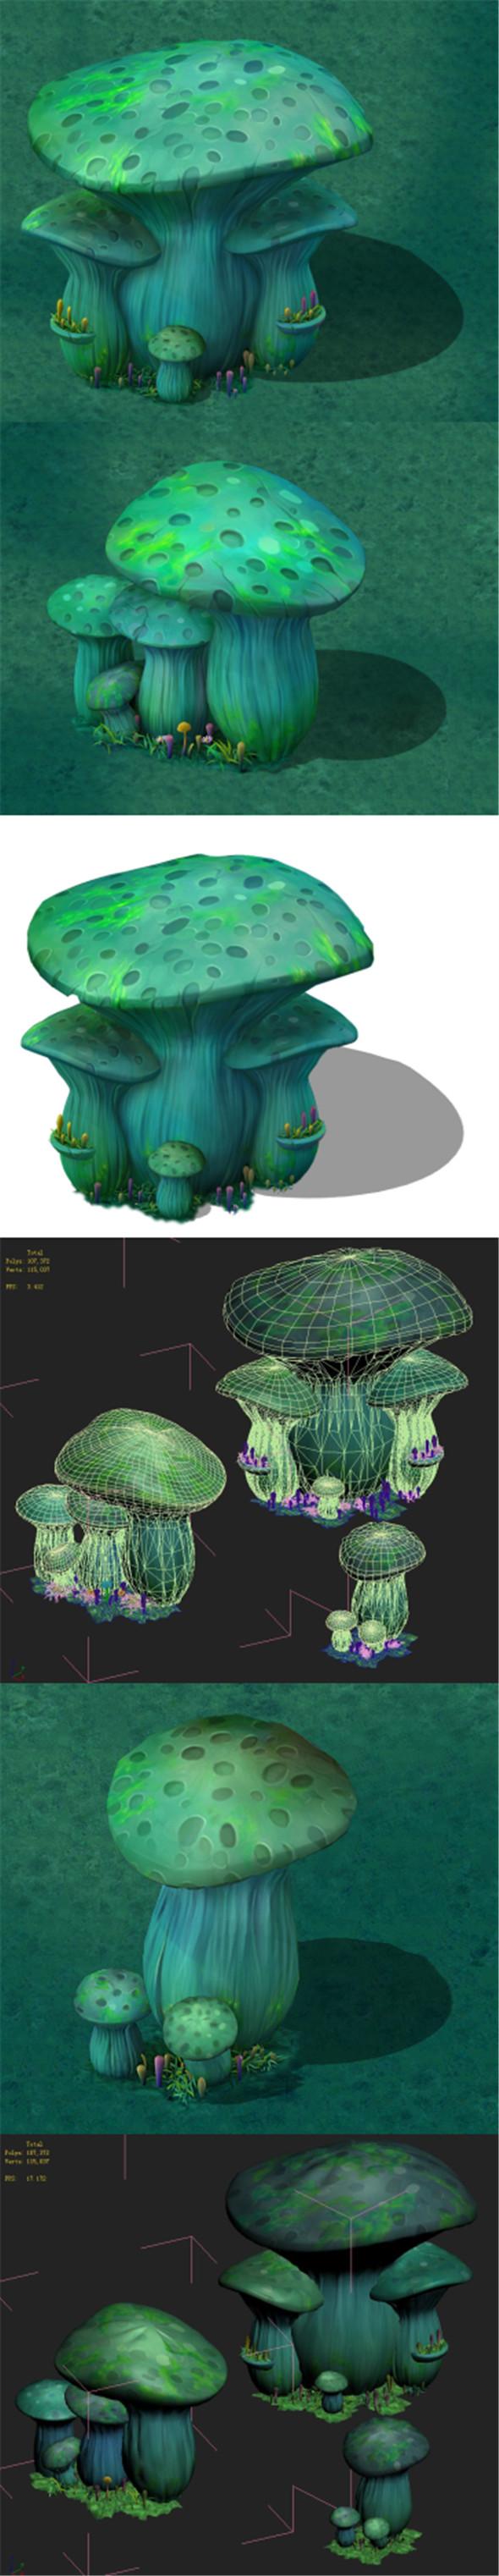 Cartoon Edition - Ancient Nu Wa Mushroom Fossil 04 - 3DOcean Item for Sale